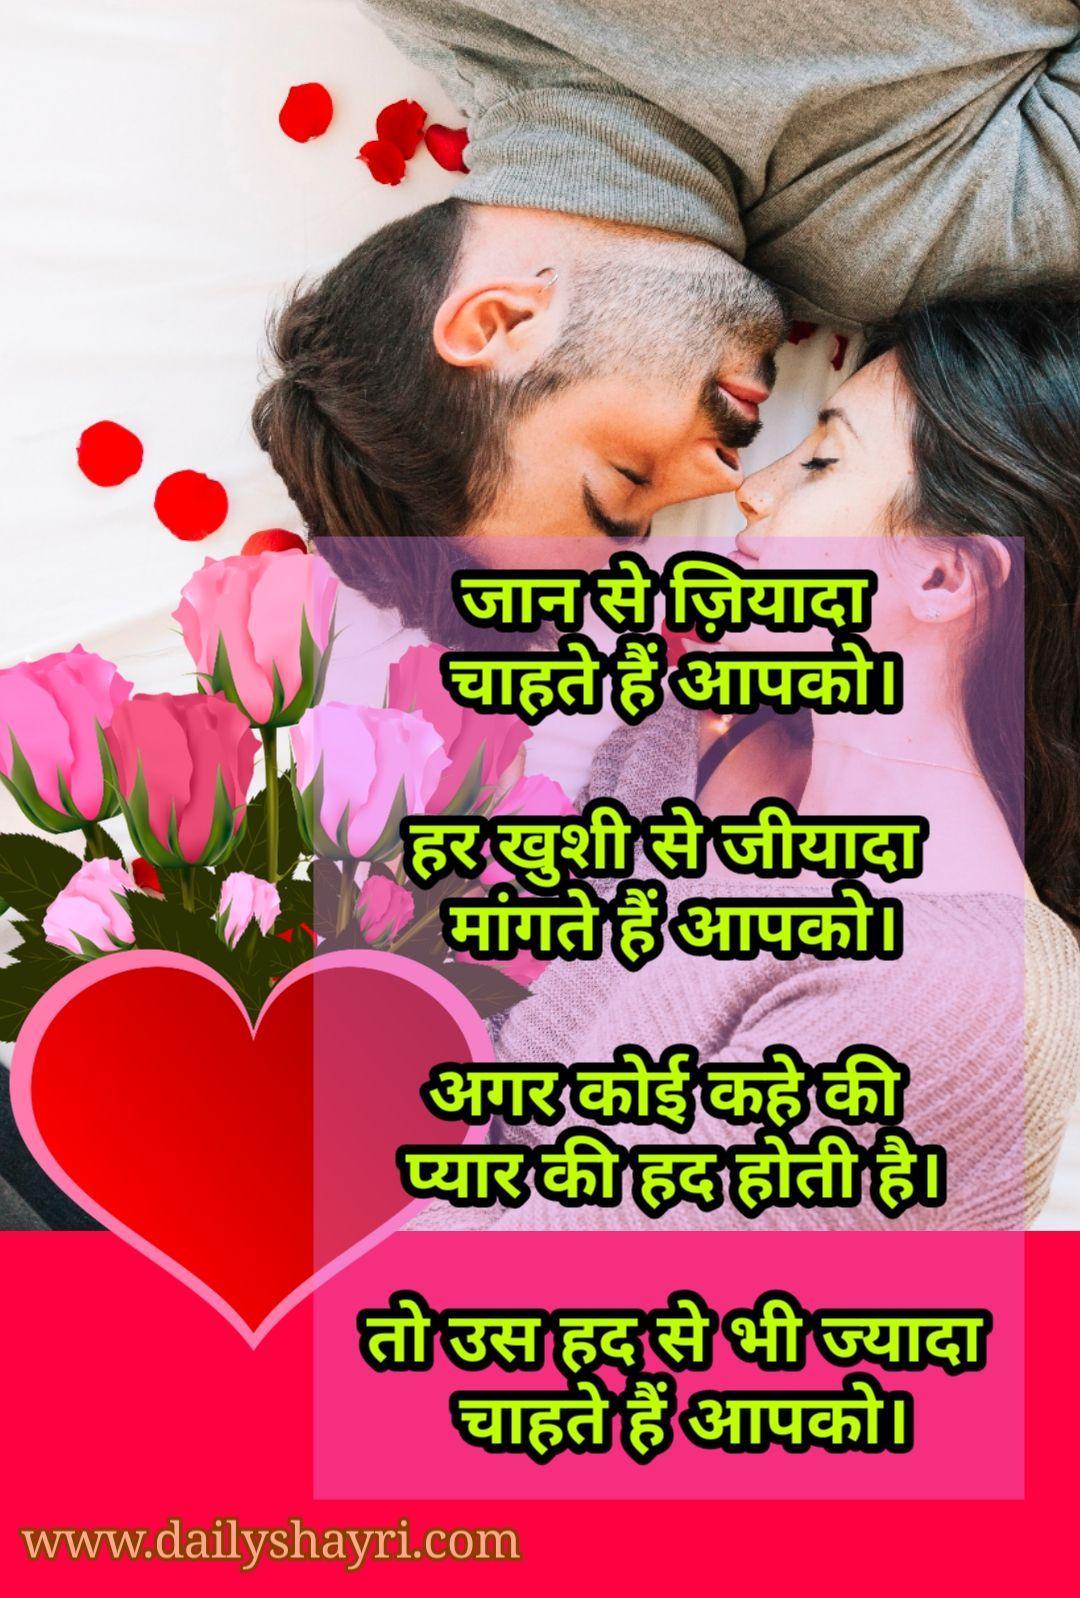 Hindi Romantic Shayari Poetry Images Cute Romantic Quotes Hindi